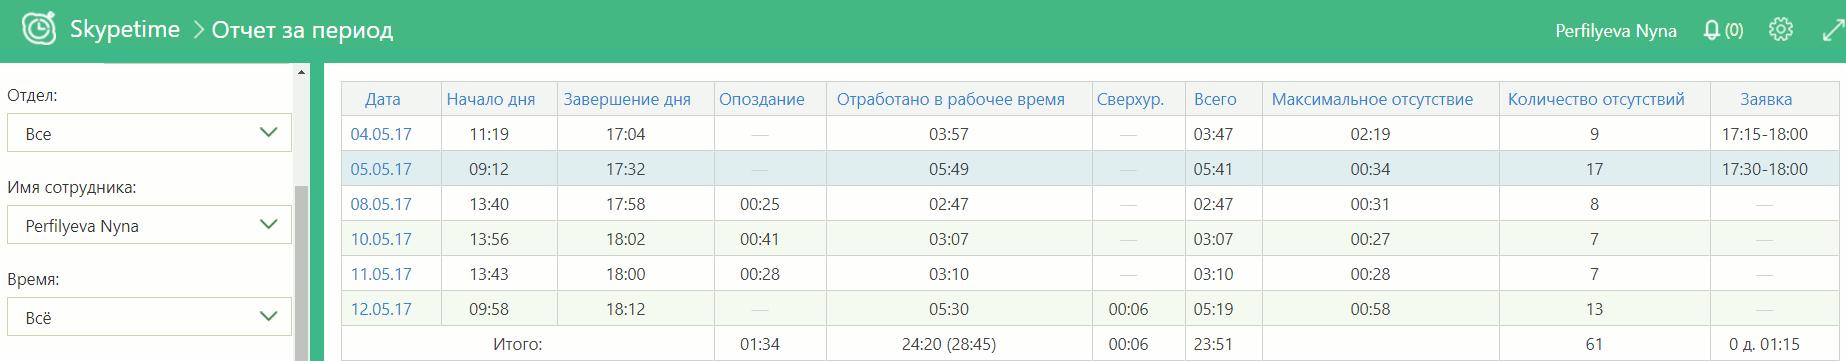 skypetime отчет за период